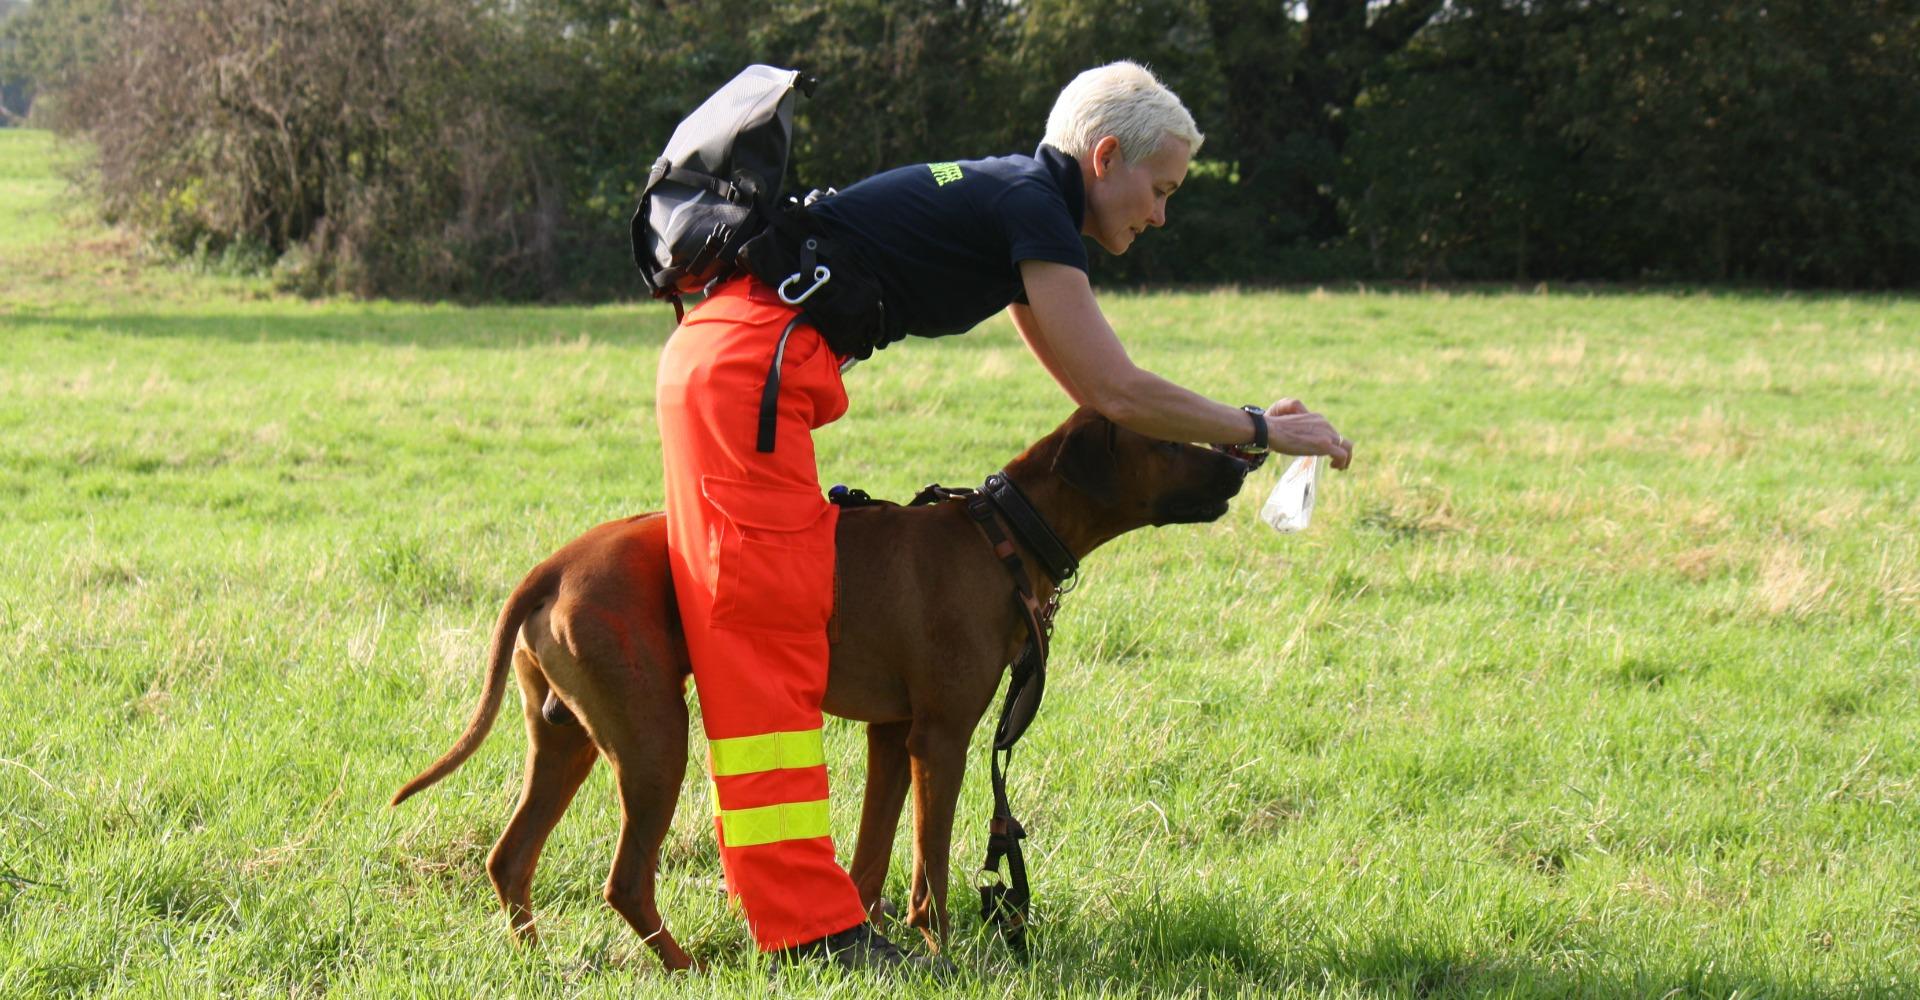 Rettungshund-Sportlich-Senco-Dogs